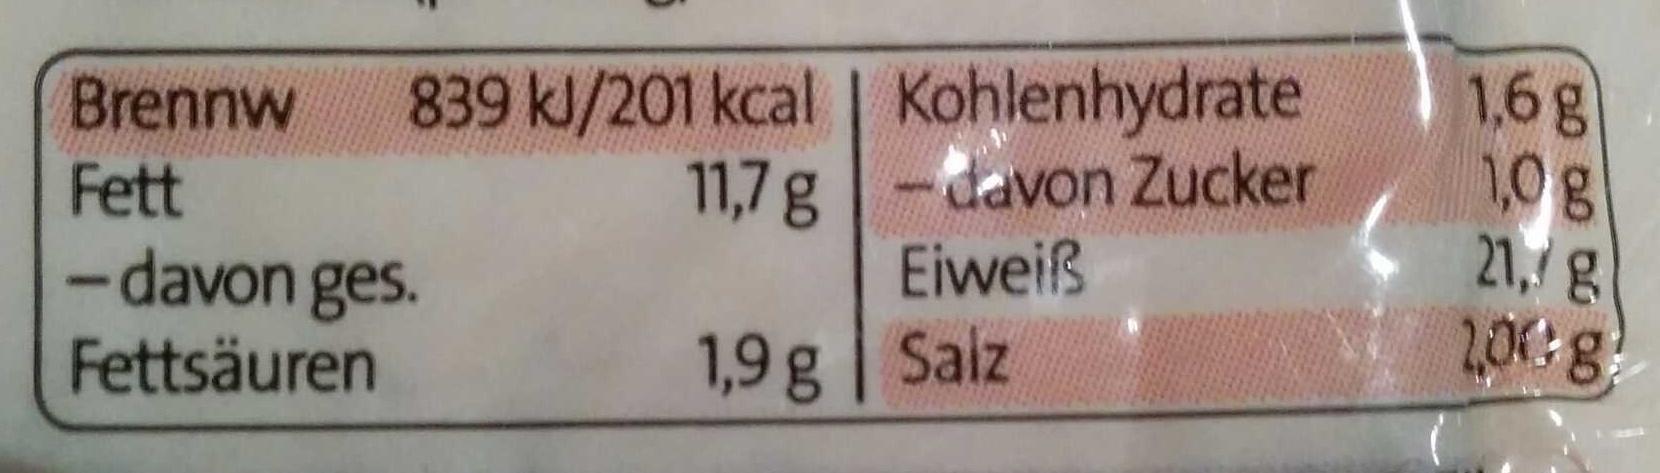 Räuchertofu Premium - Nutrition facts - de